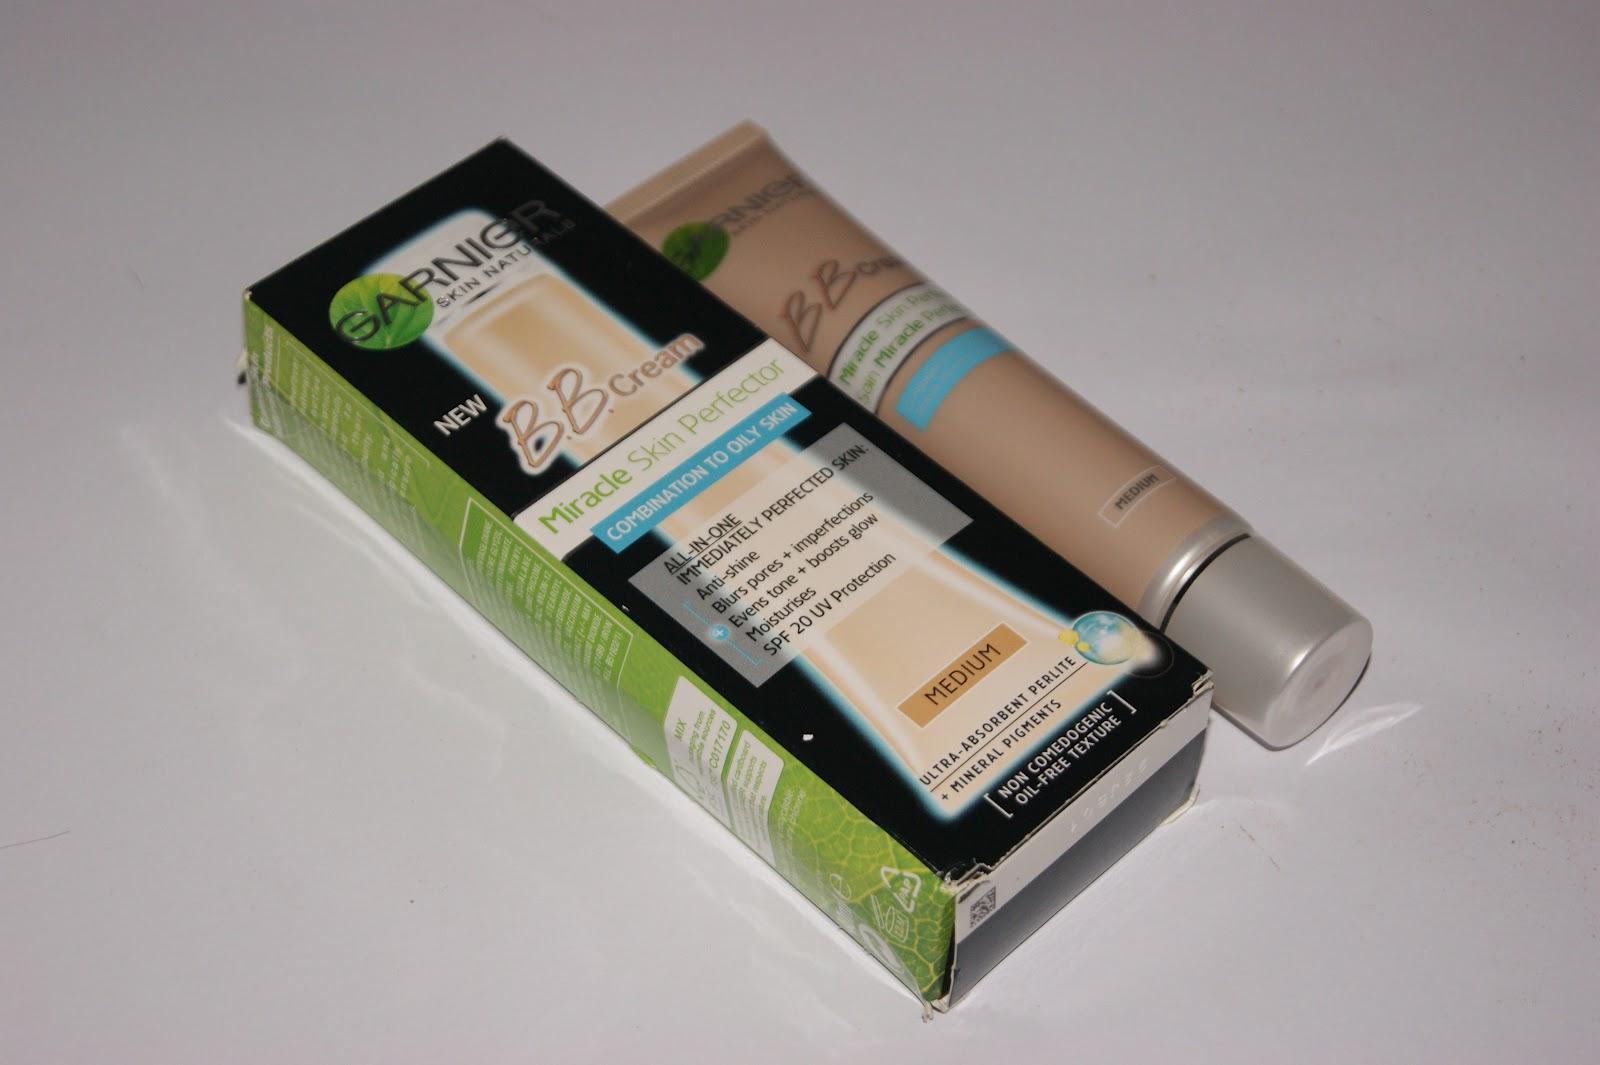 BB Cream Skin Renew by garnier #17